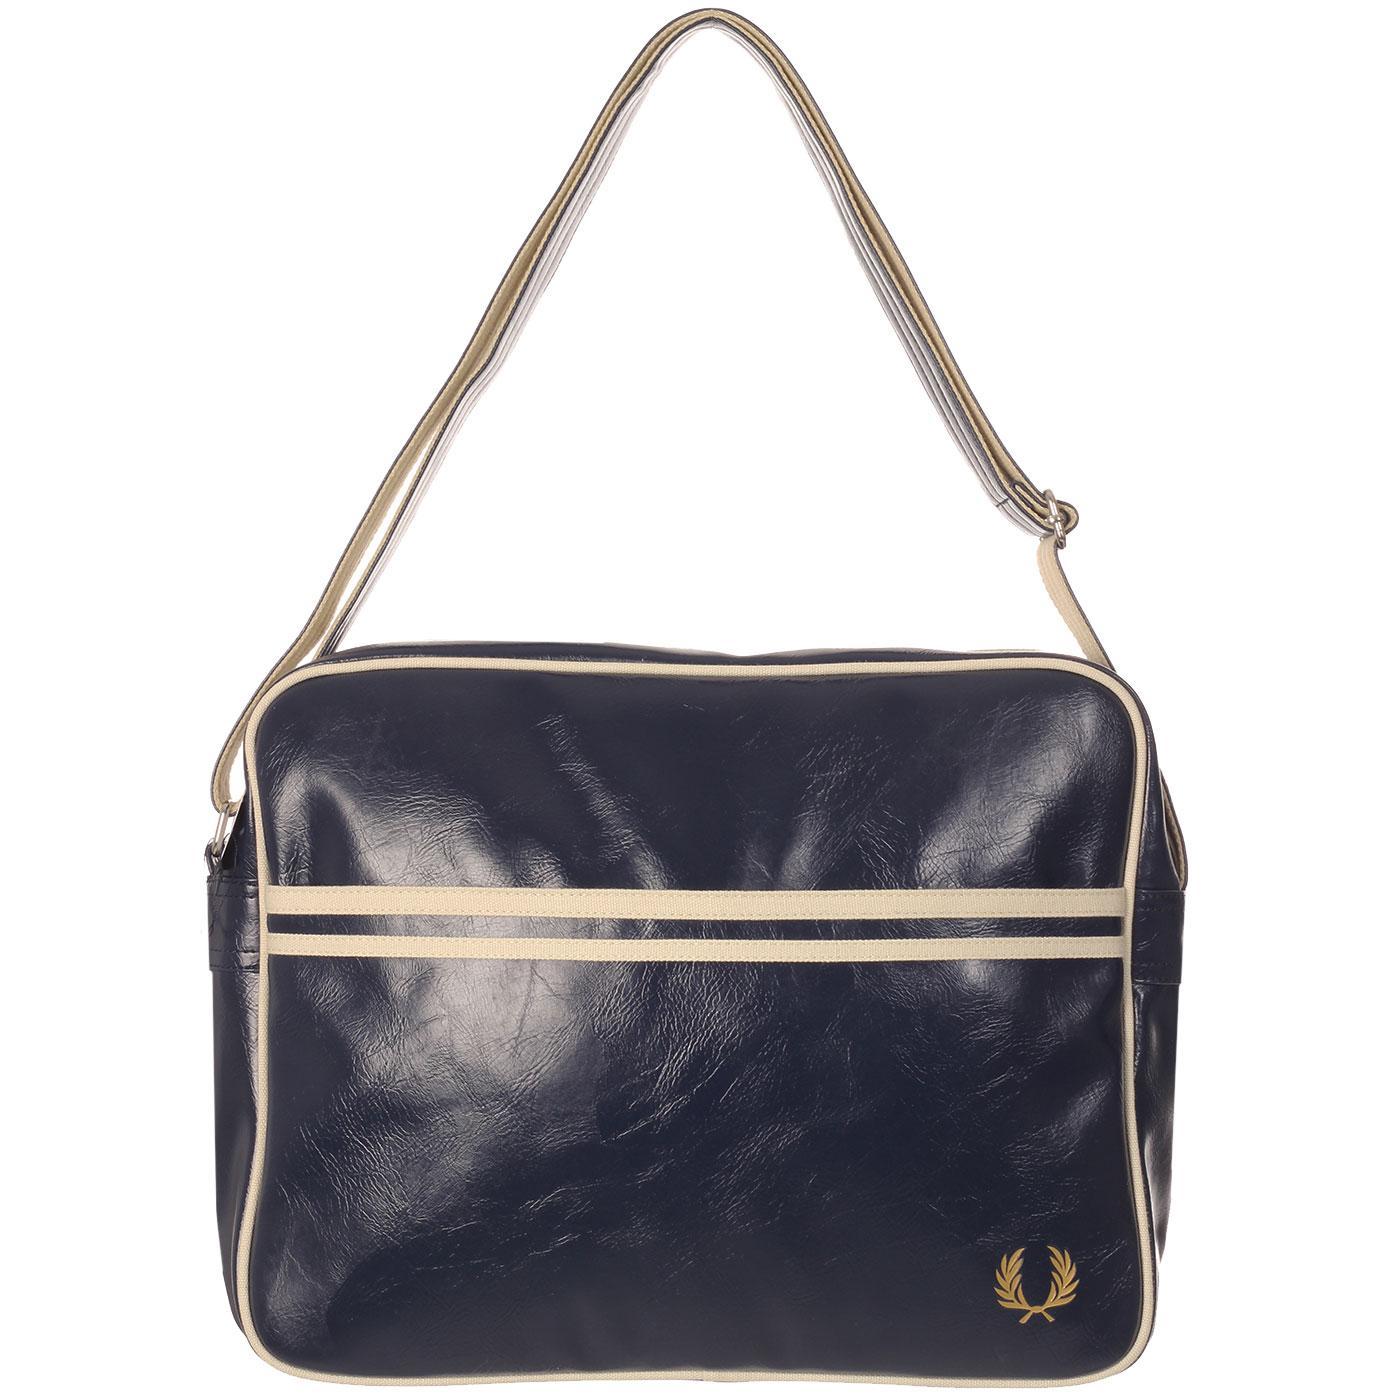 FRED PERRY Retro Classic Shoulder Bag - Navy/Ecru